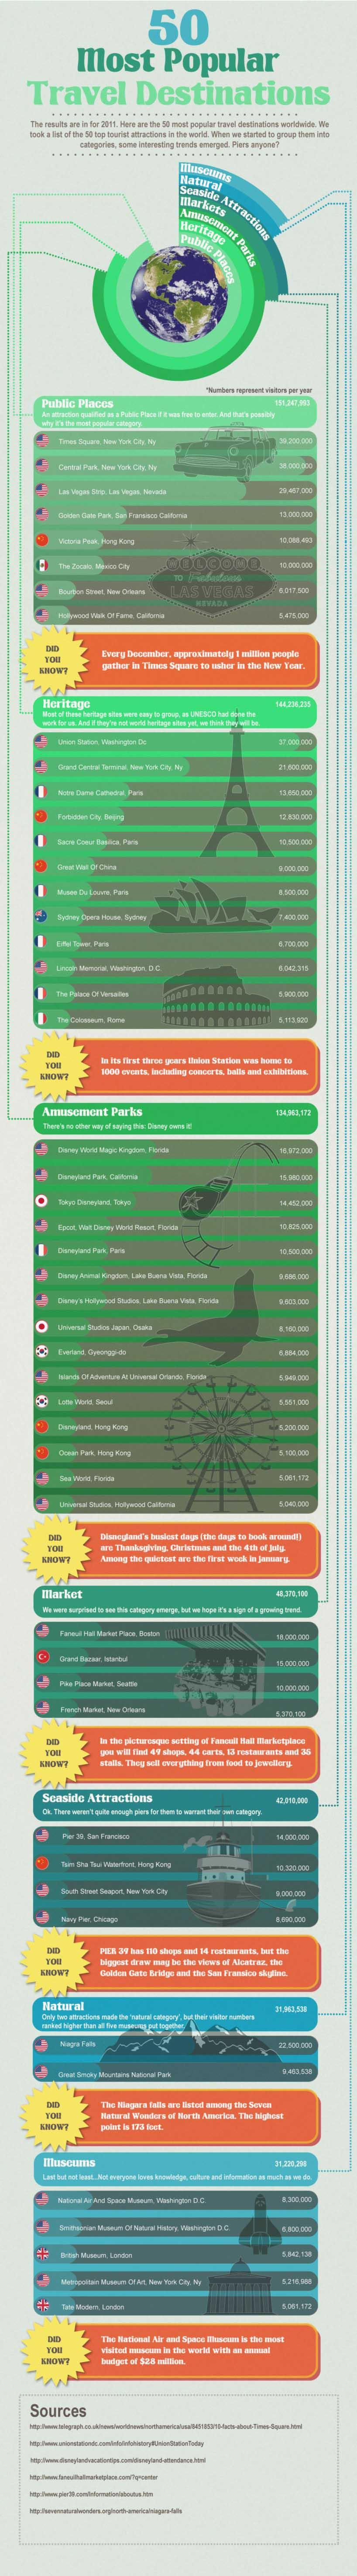 The 50 Most Popular Travel Destinations